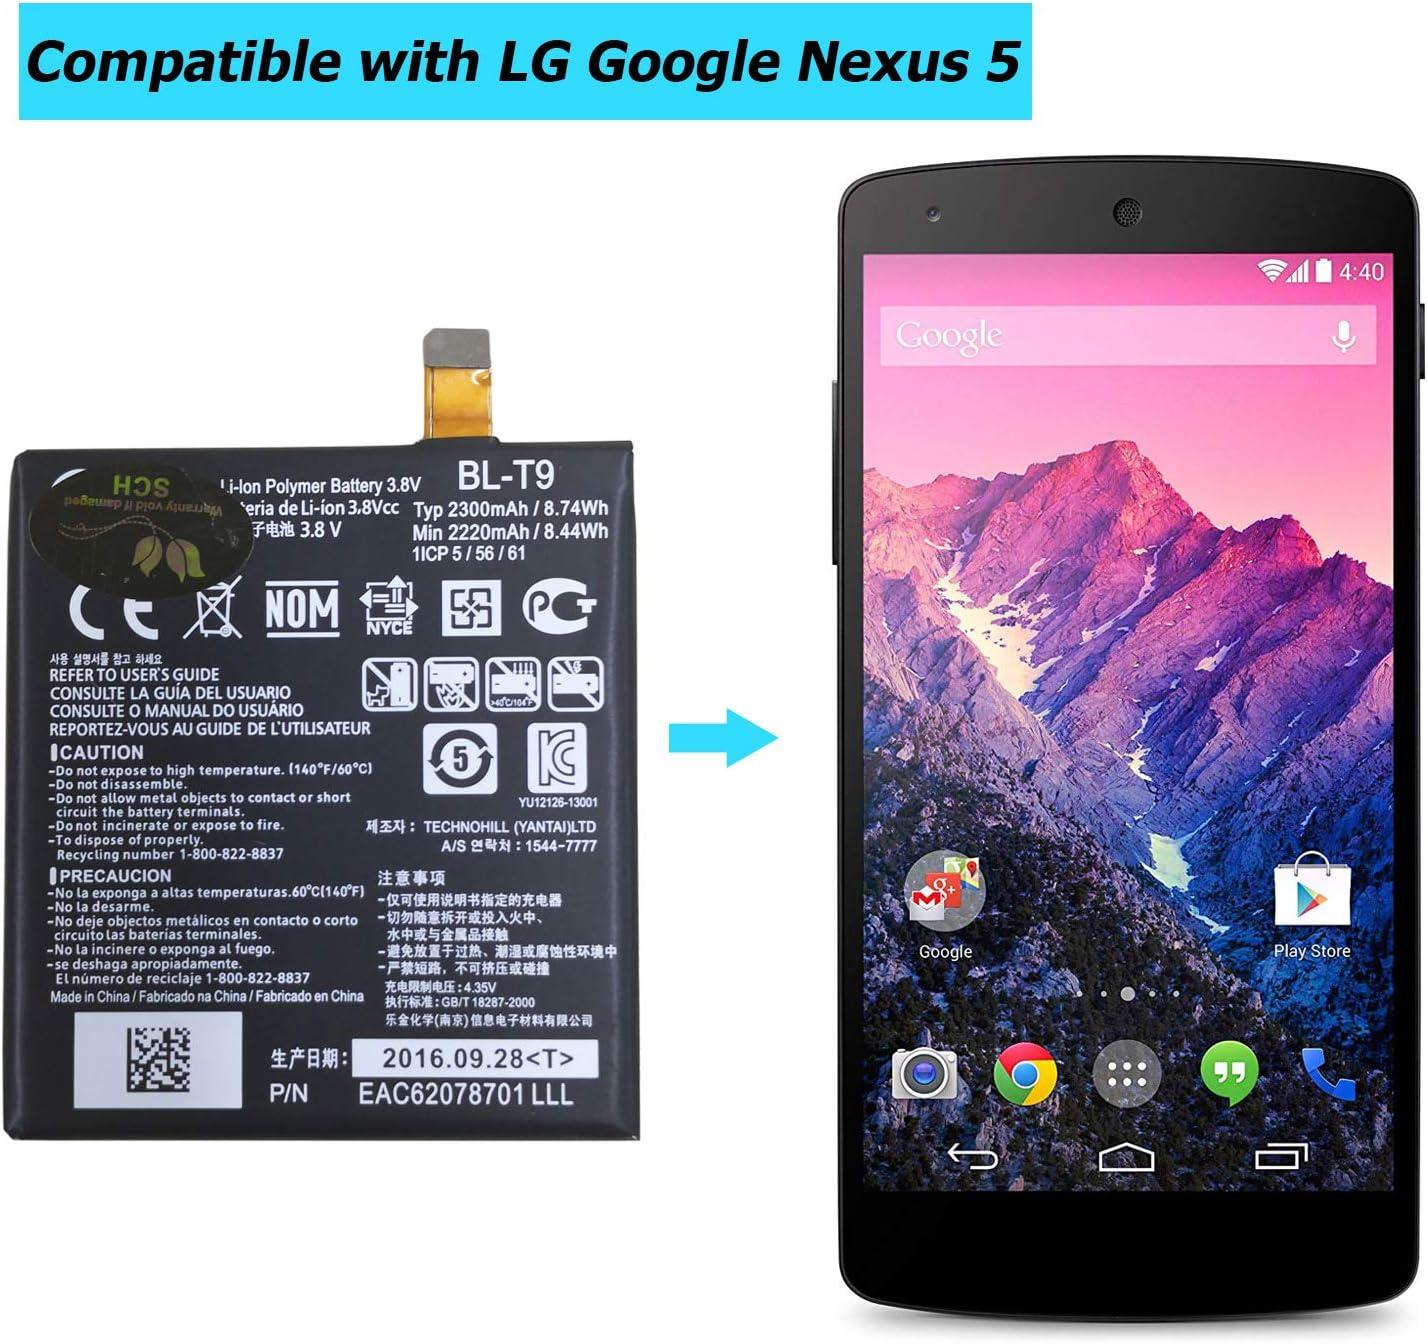 Upplus BL-T9 - Batería de Repuesto para LG Google Nexus 5 LG D820 ...